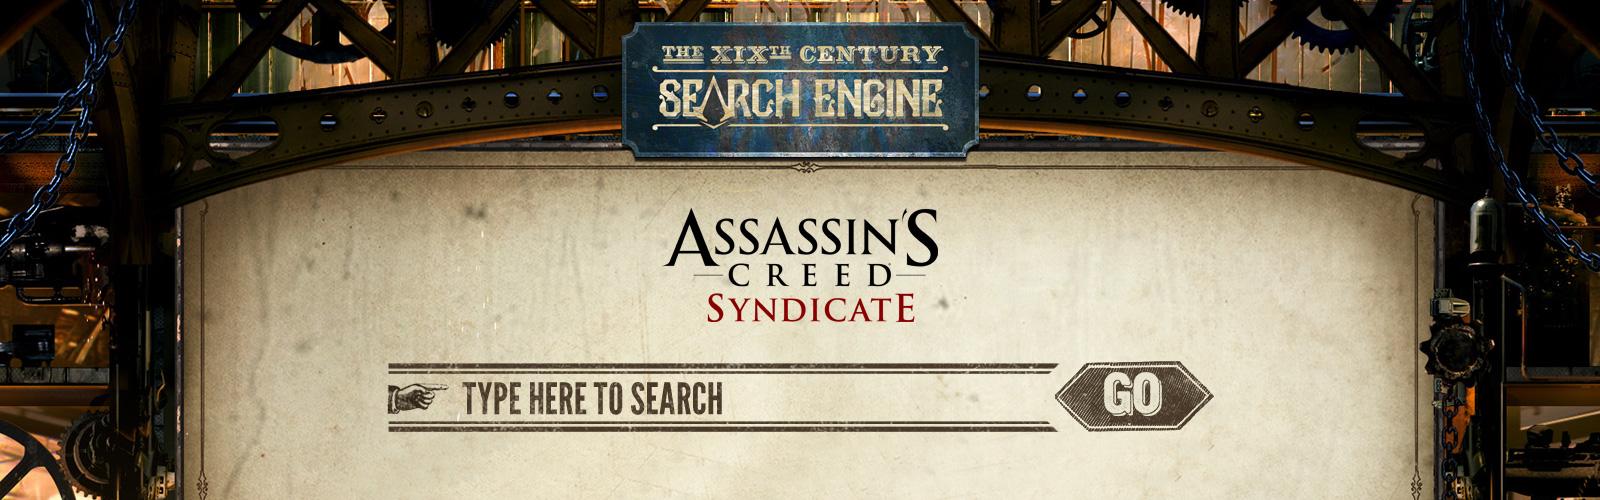 [2015-10-05] ACS_NEWS - EMEA - search engine - header